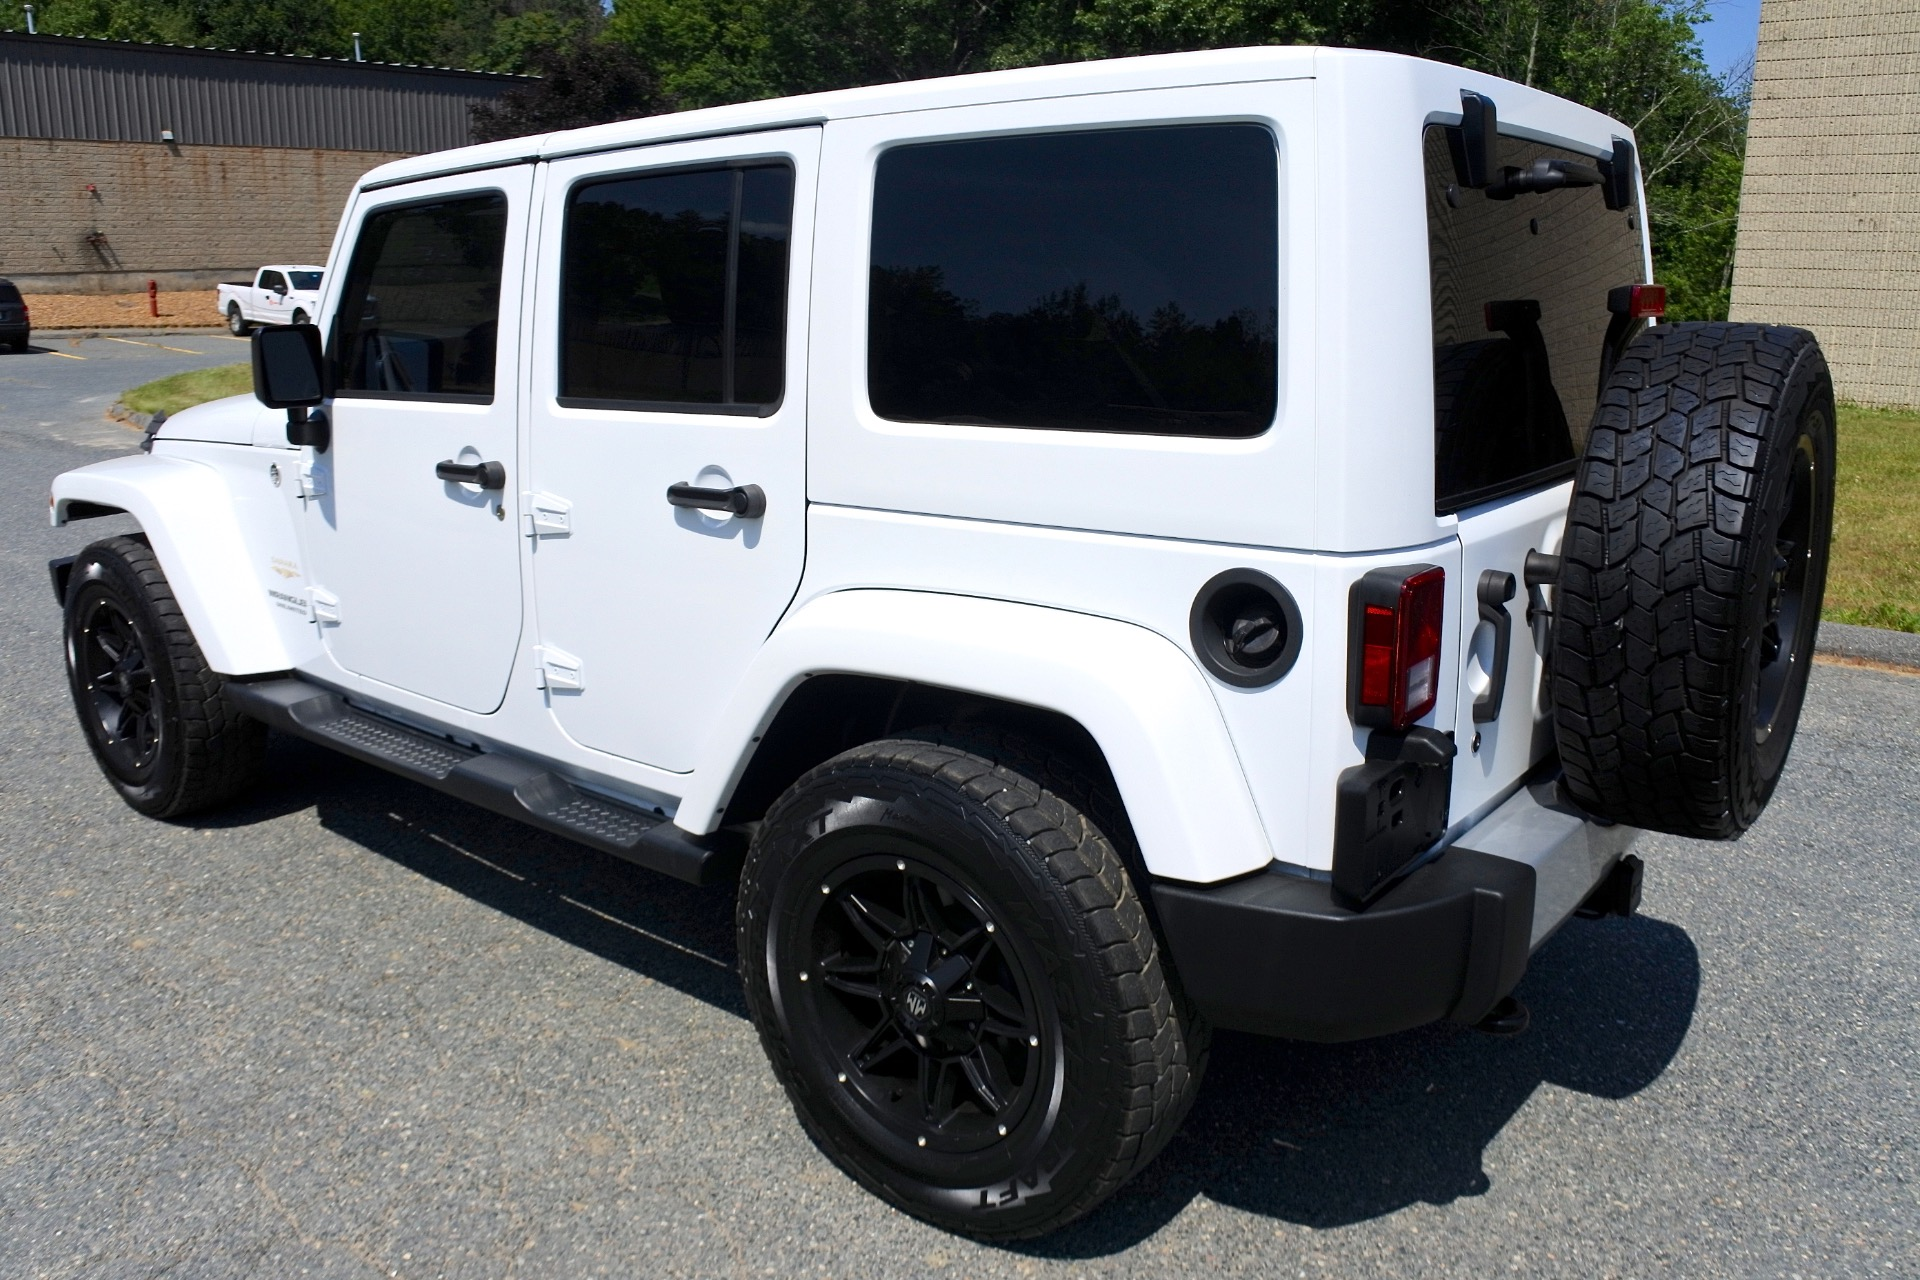 Used 2015 Jeep Wrangler Unlimited 4WD 4dr Sahara Used 2015 Jeep Wrangler Unlimited 4WD 4dr Sahara for sale  at Metro West Motorcars LLC in Shrewsbury MA 3